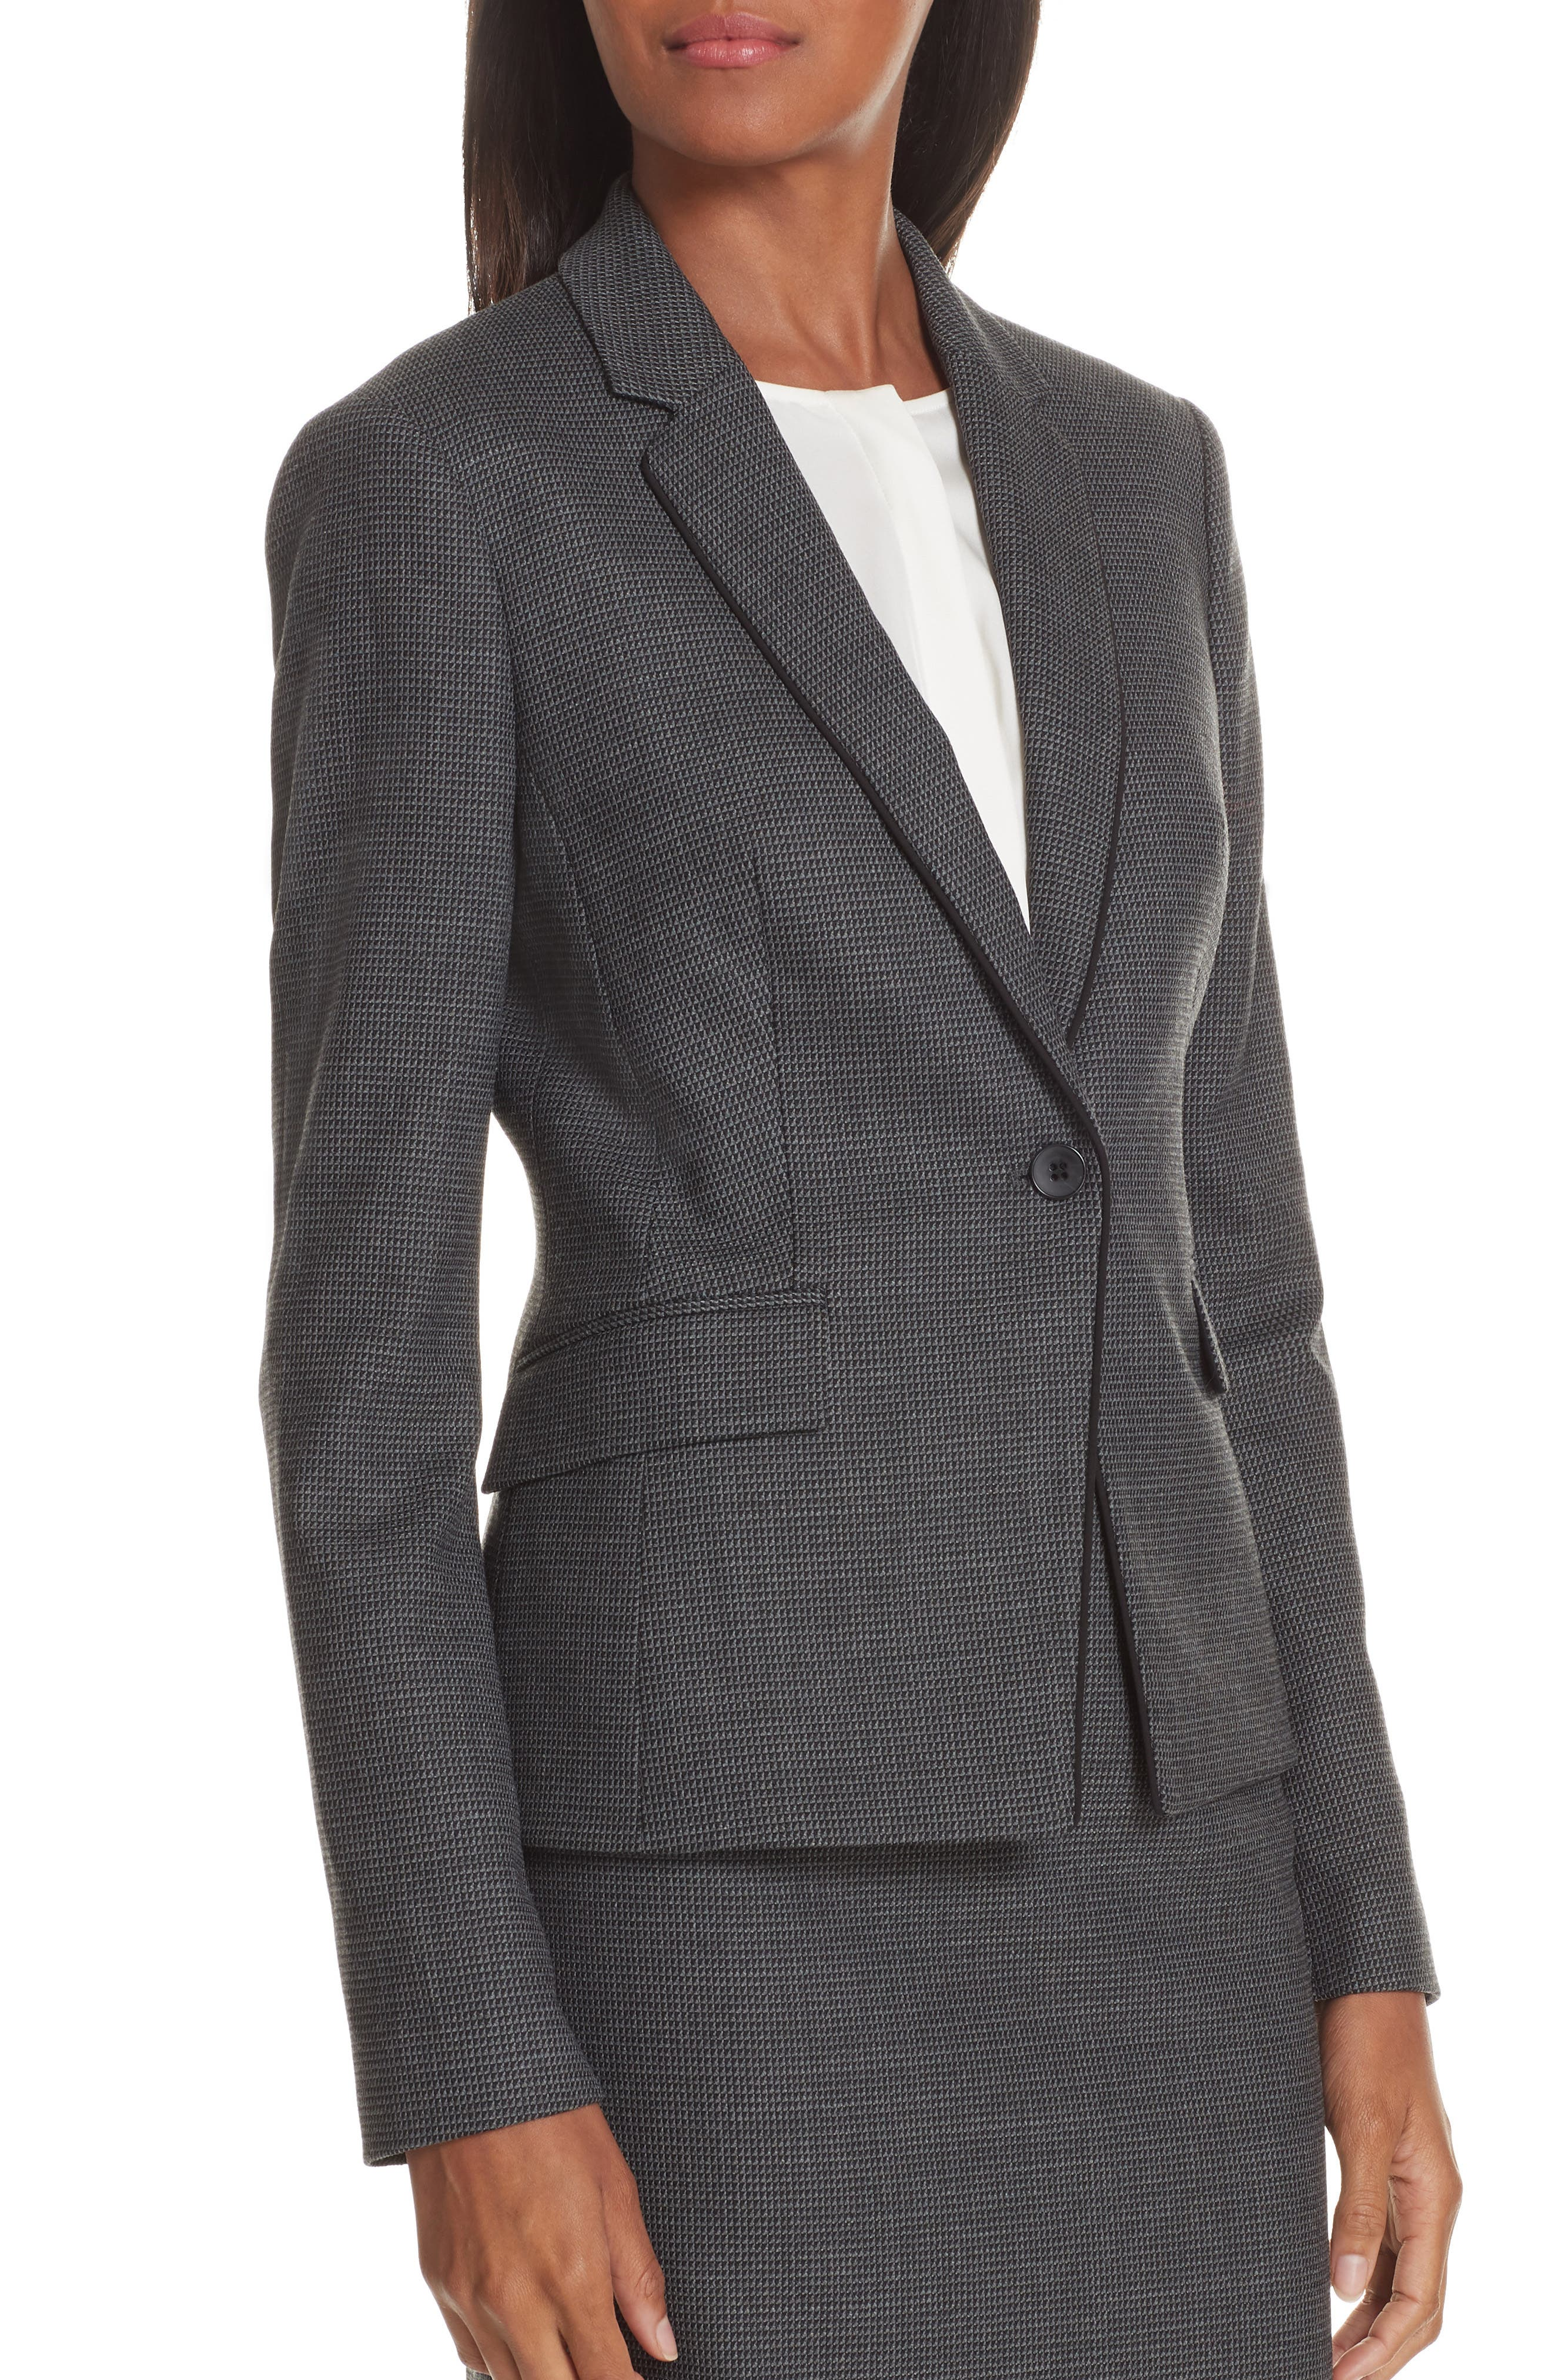 Jorita Geometric Wool Blend Suit Jacket,                             Alternate thumbnail 4, color,                             GREY FANTASY